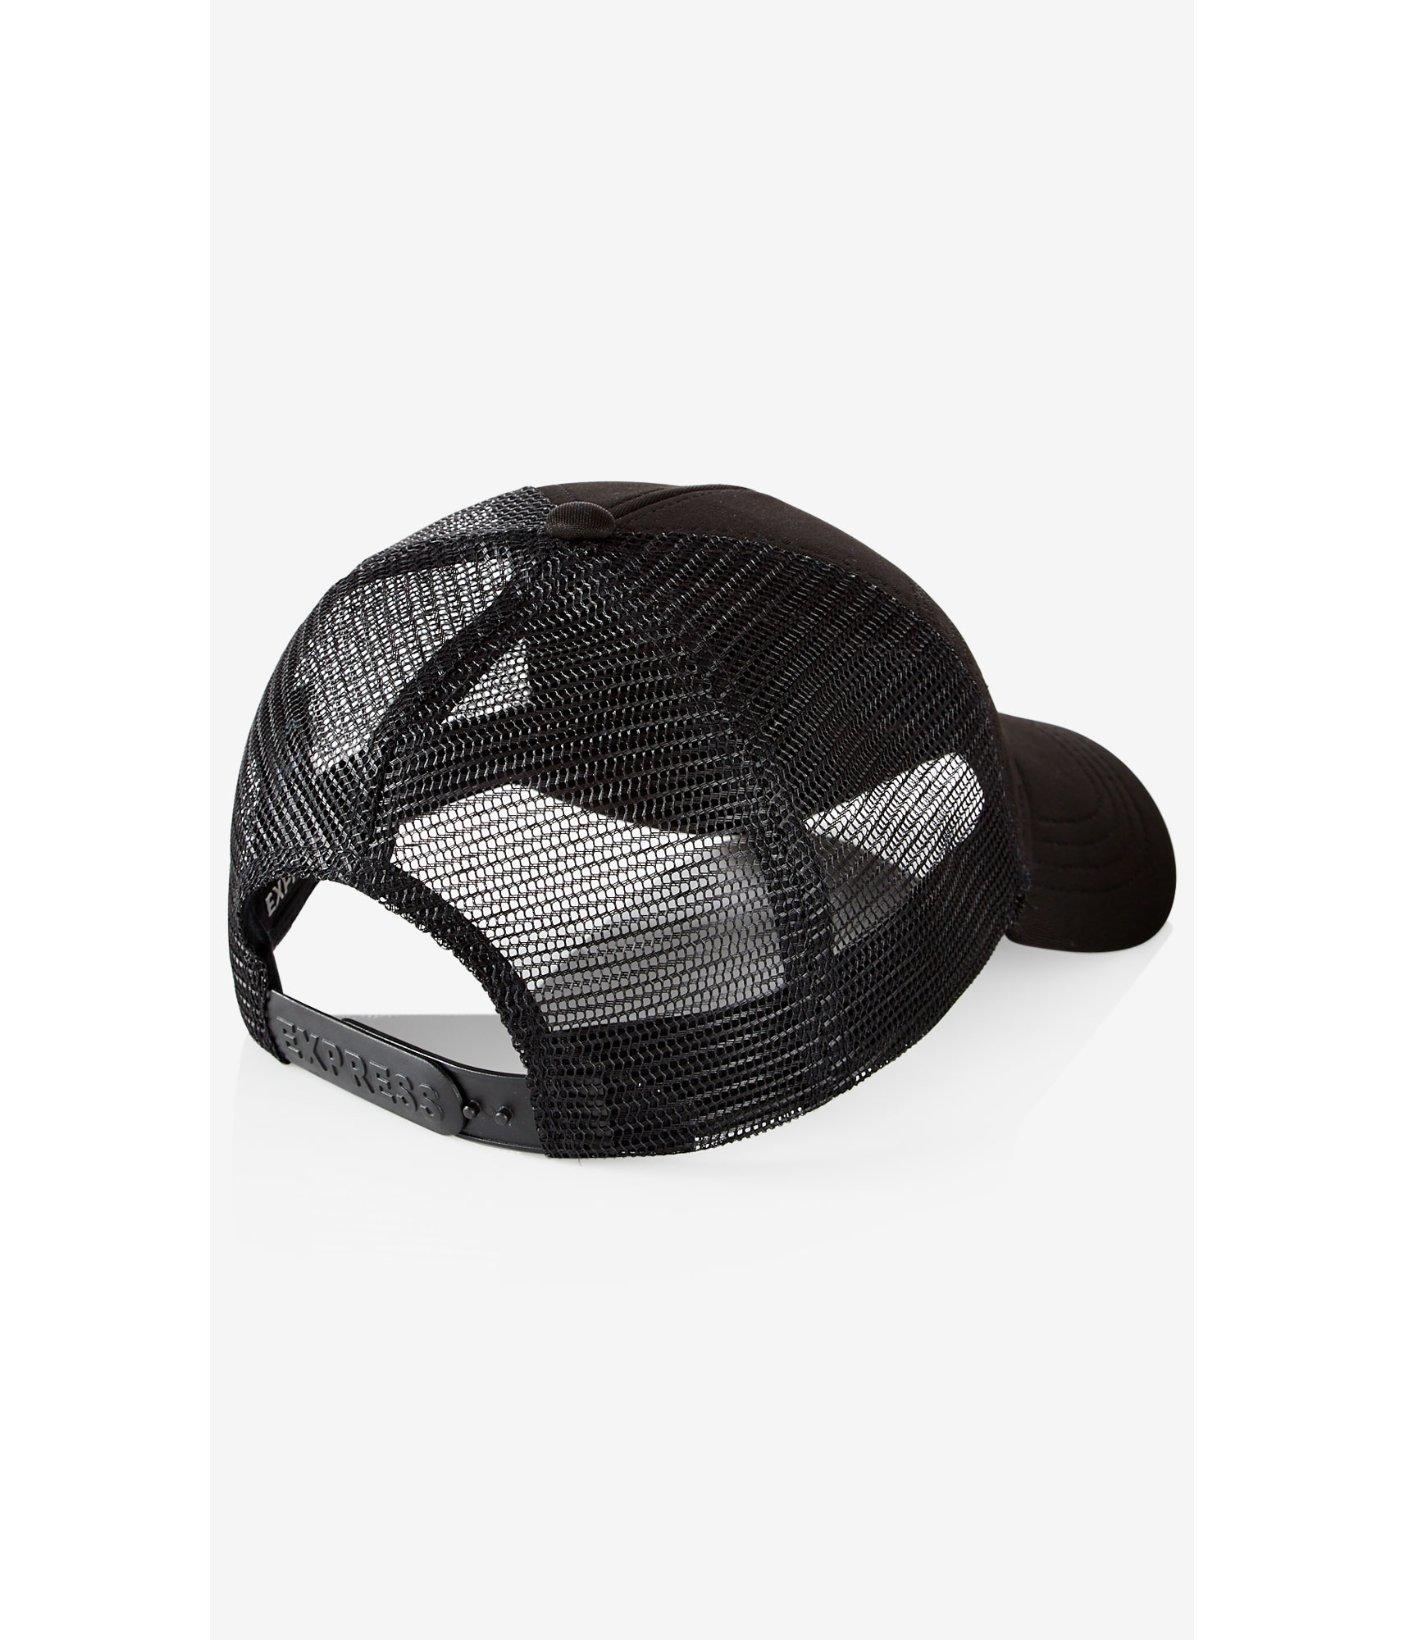 43b8d6defe4 Lyst - Express Stitched Chevron Trucker Hat in Black for Men